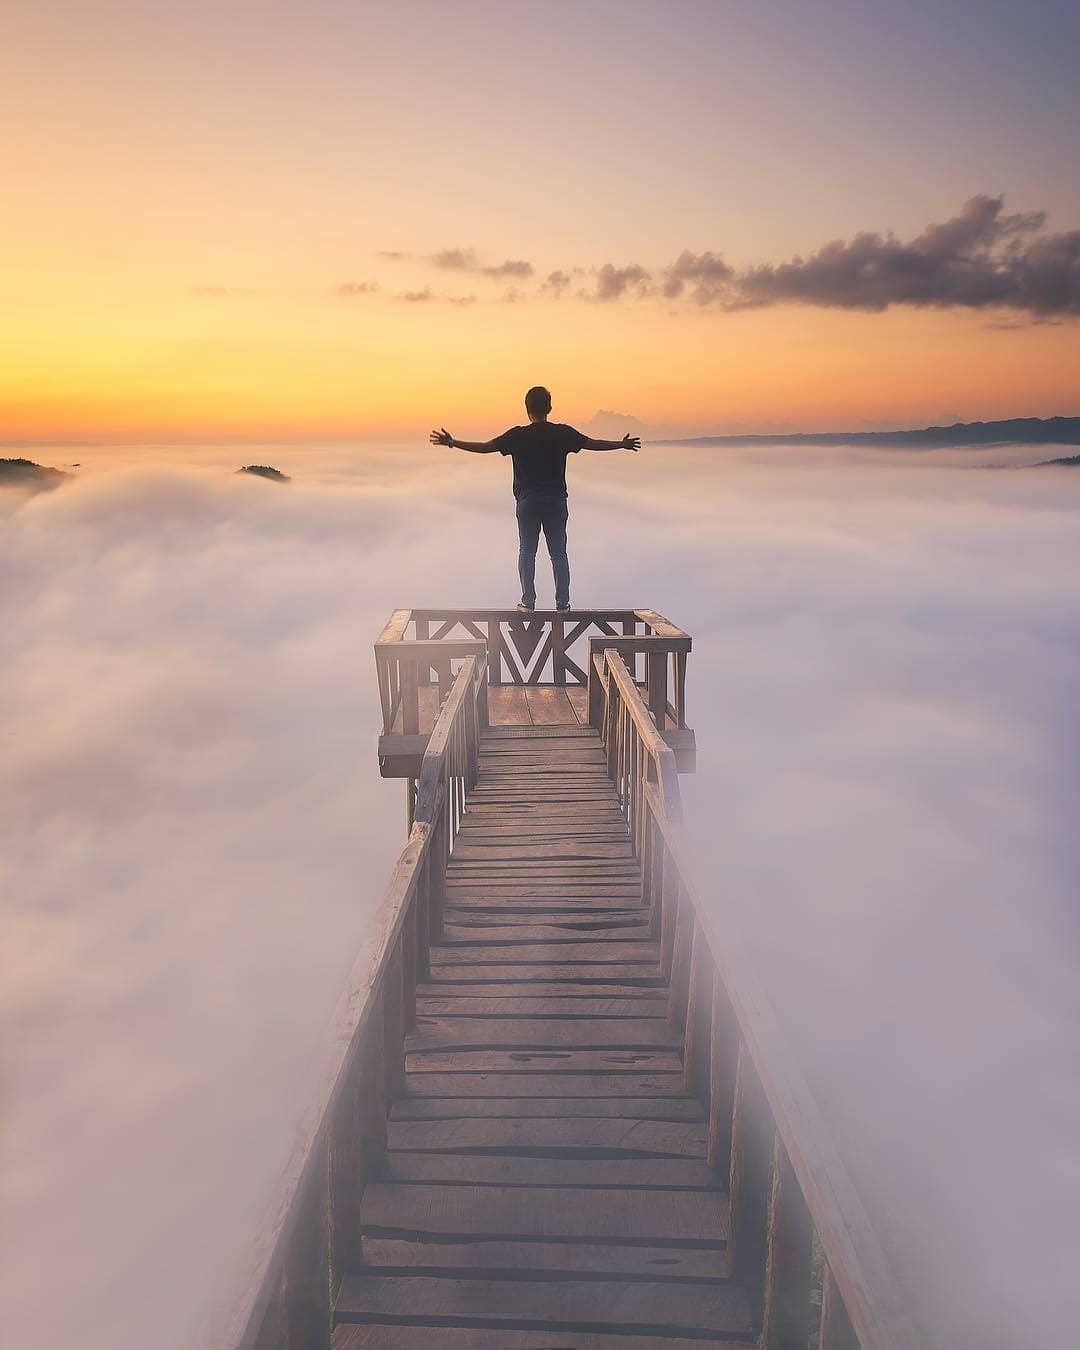 Pemandangan pagi hari di Bukit Panguk Kedawung yang indah